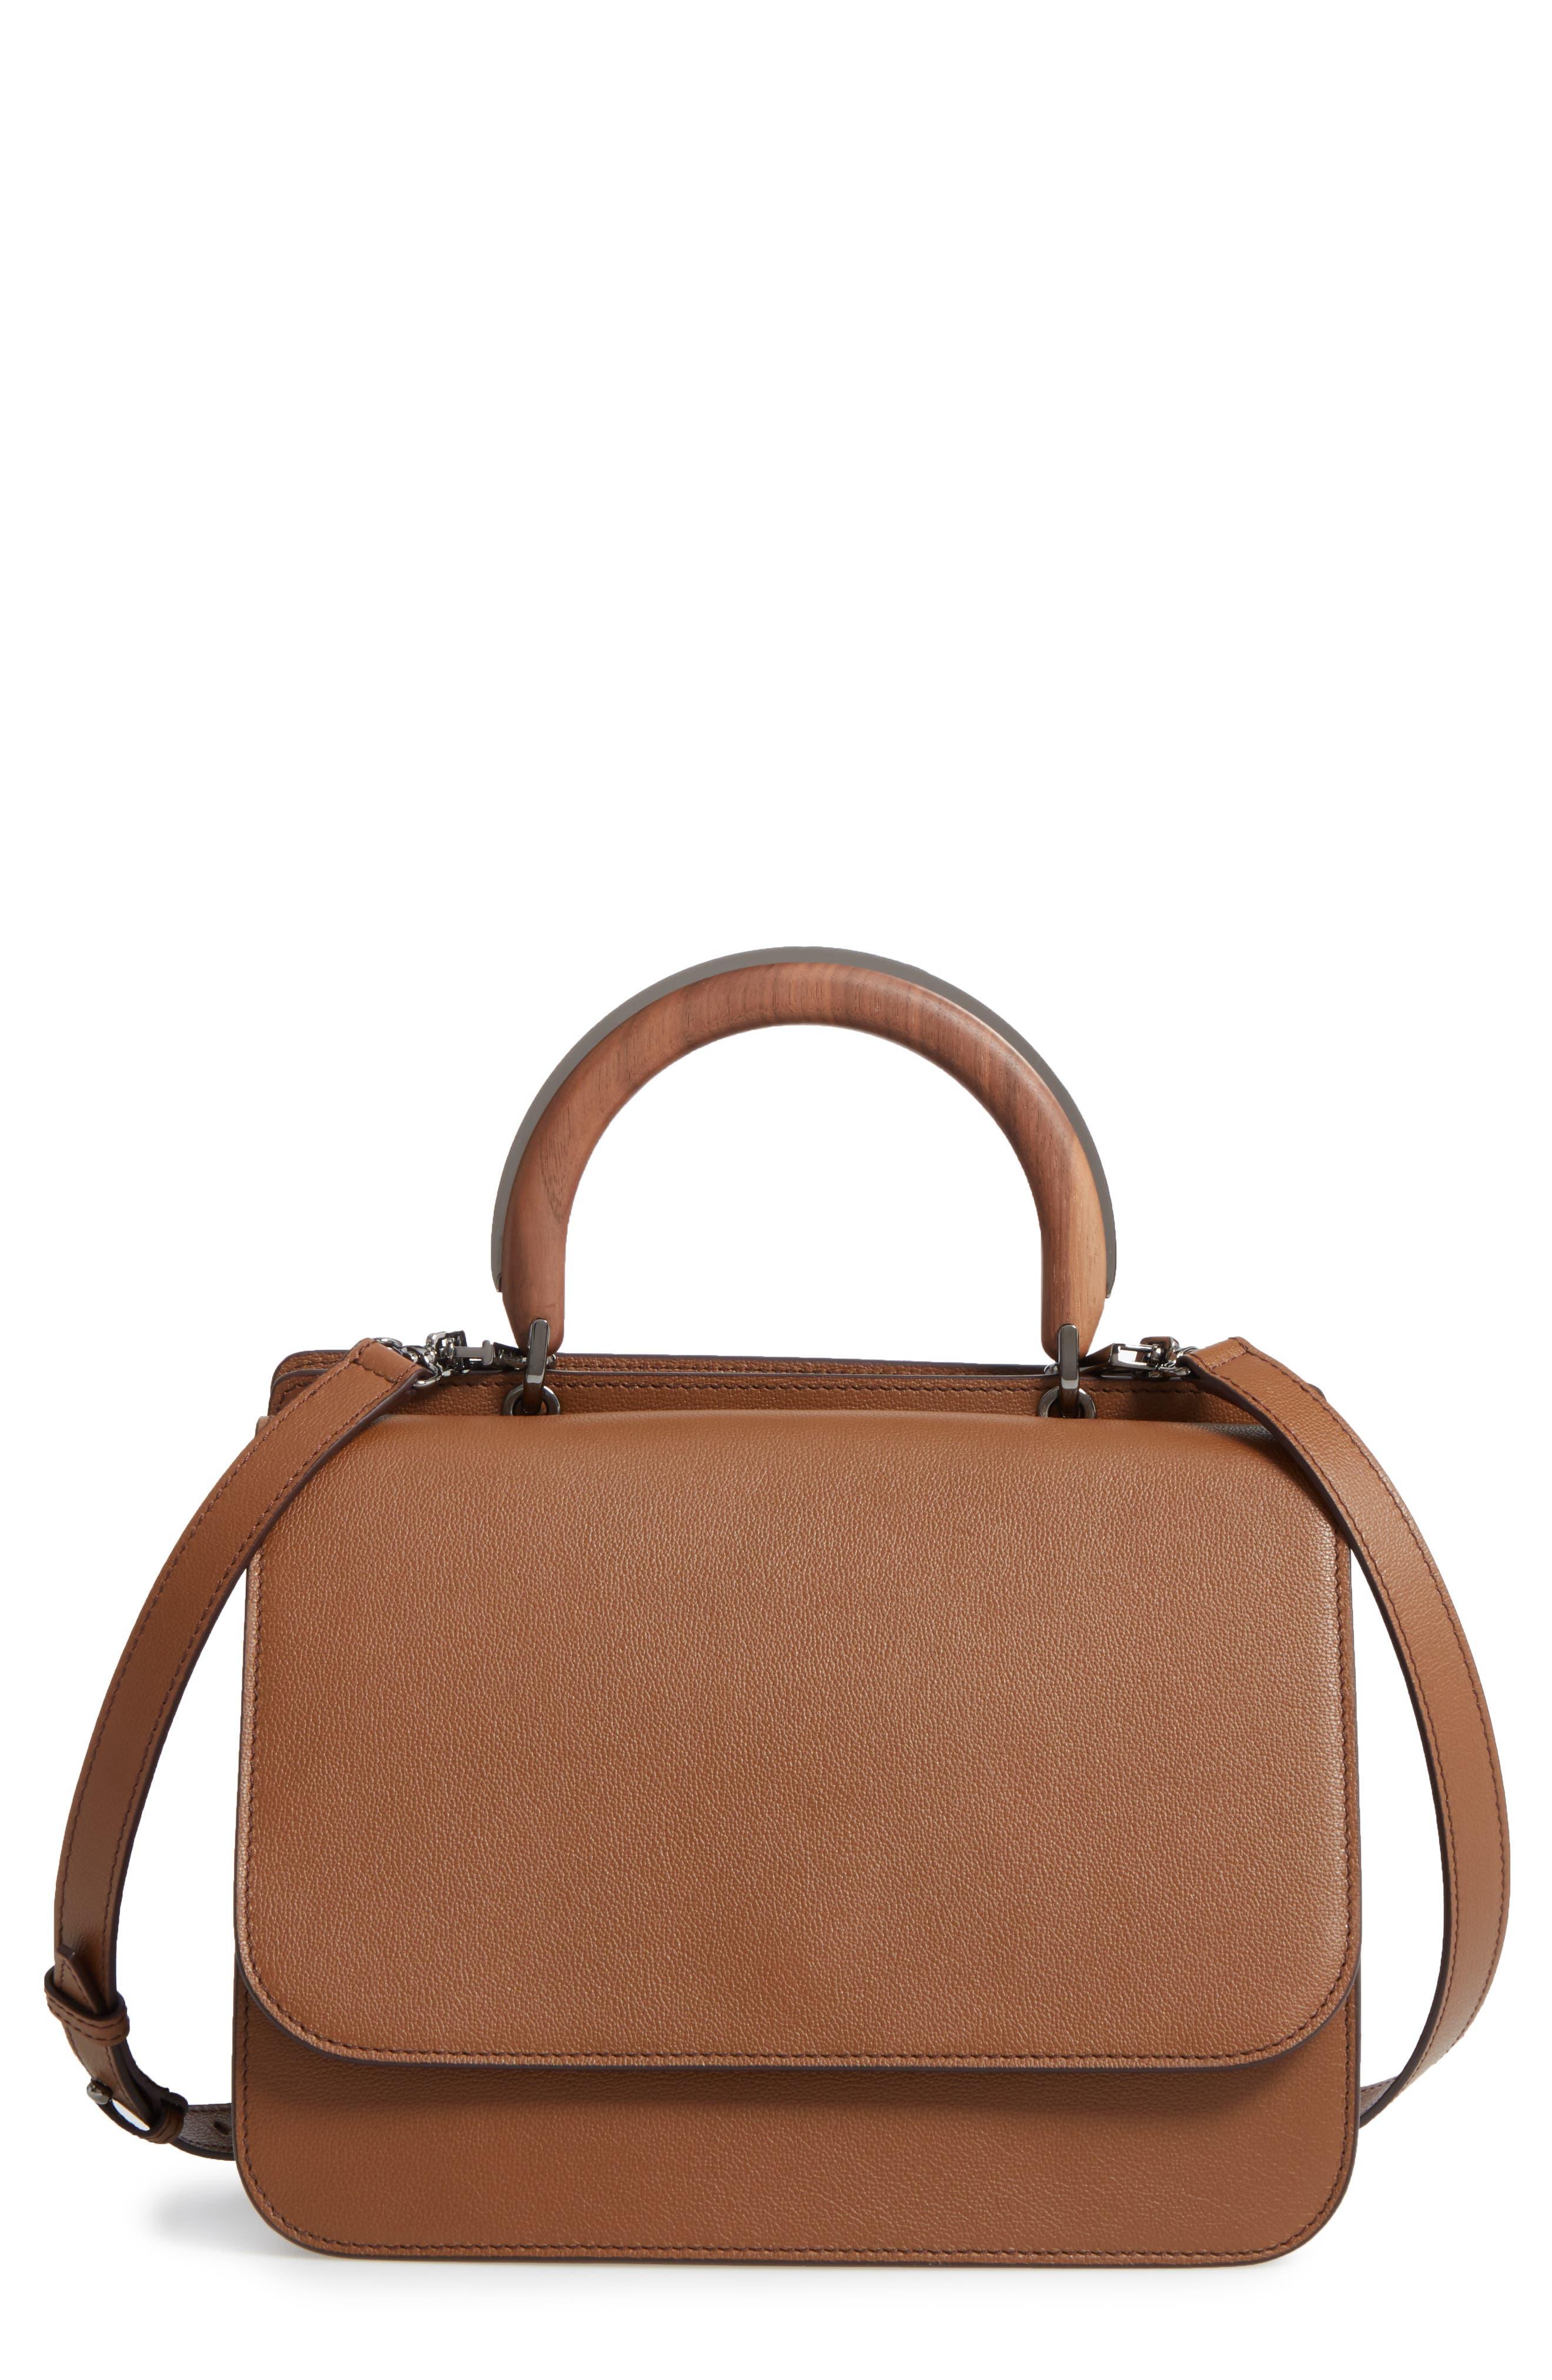 Max Mara New Venzia Wood Top Handle Leather Satchel